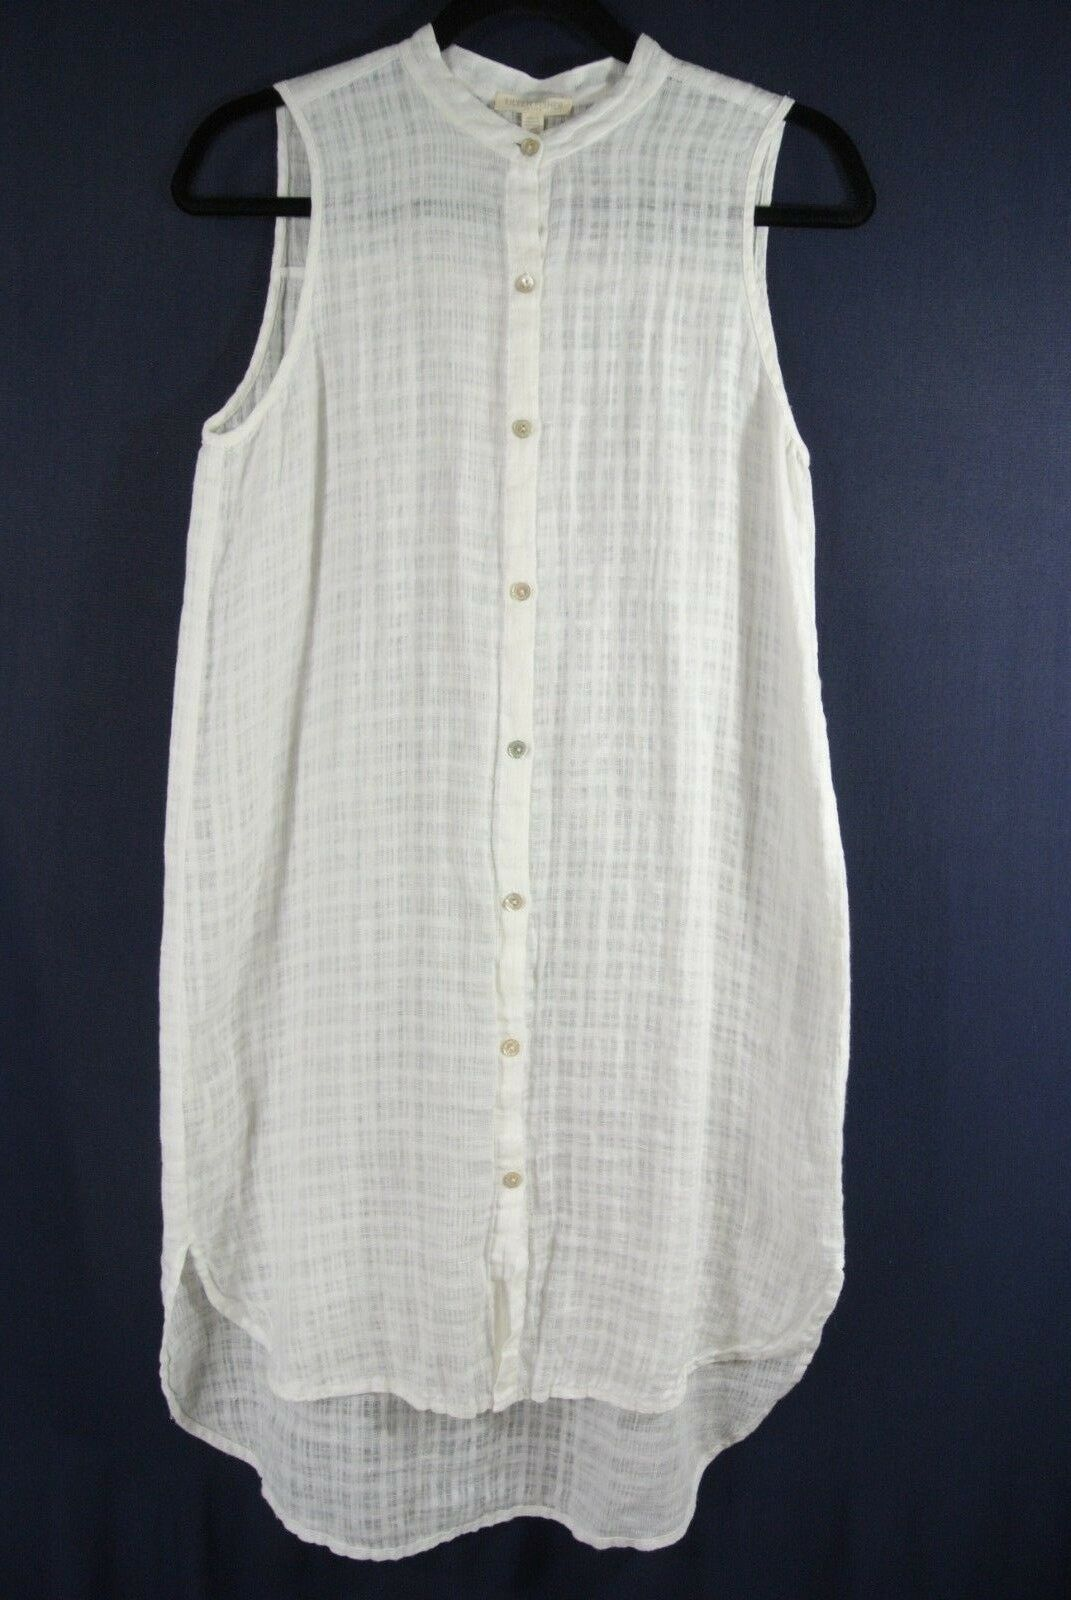 NEW Eileen Fisher Linen Mandarin Collar Tunic in Weiß - Größe PS  T331